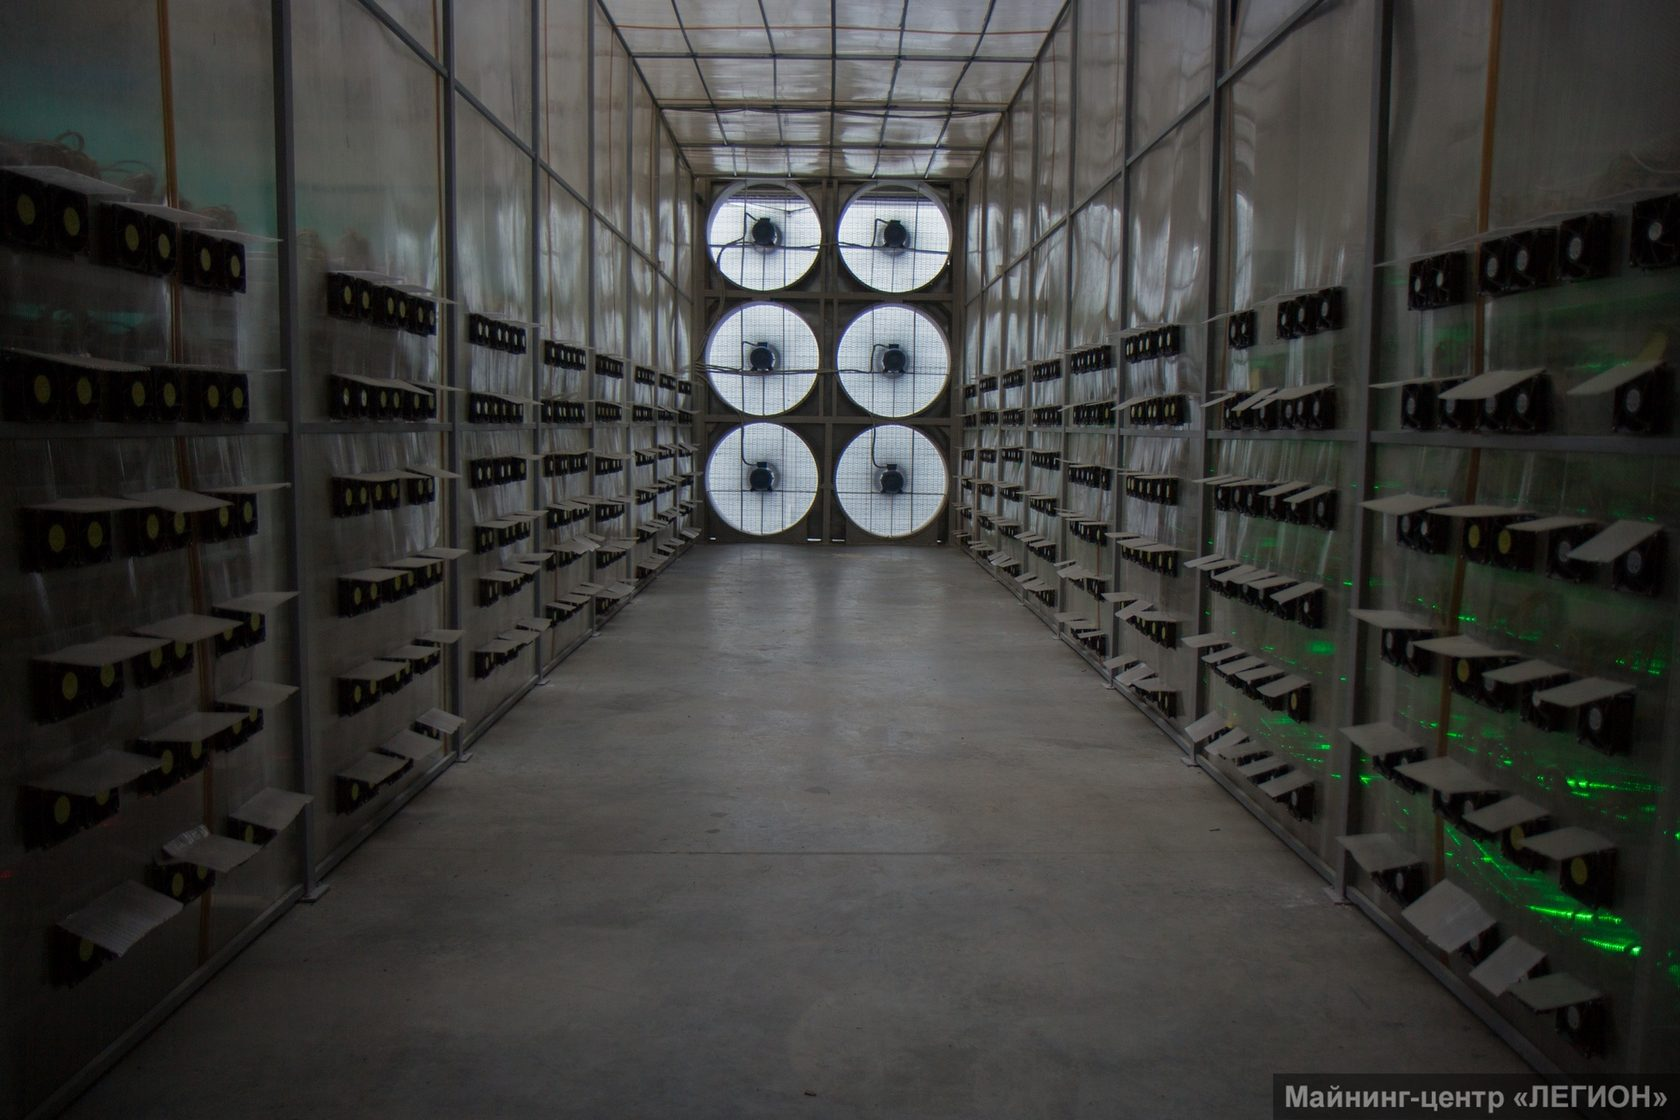 Майнинг darknet hyrda вход darknet marketplace вход на гидру